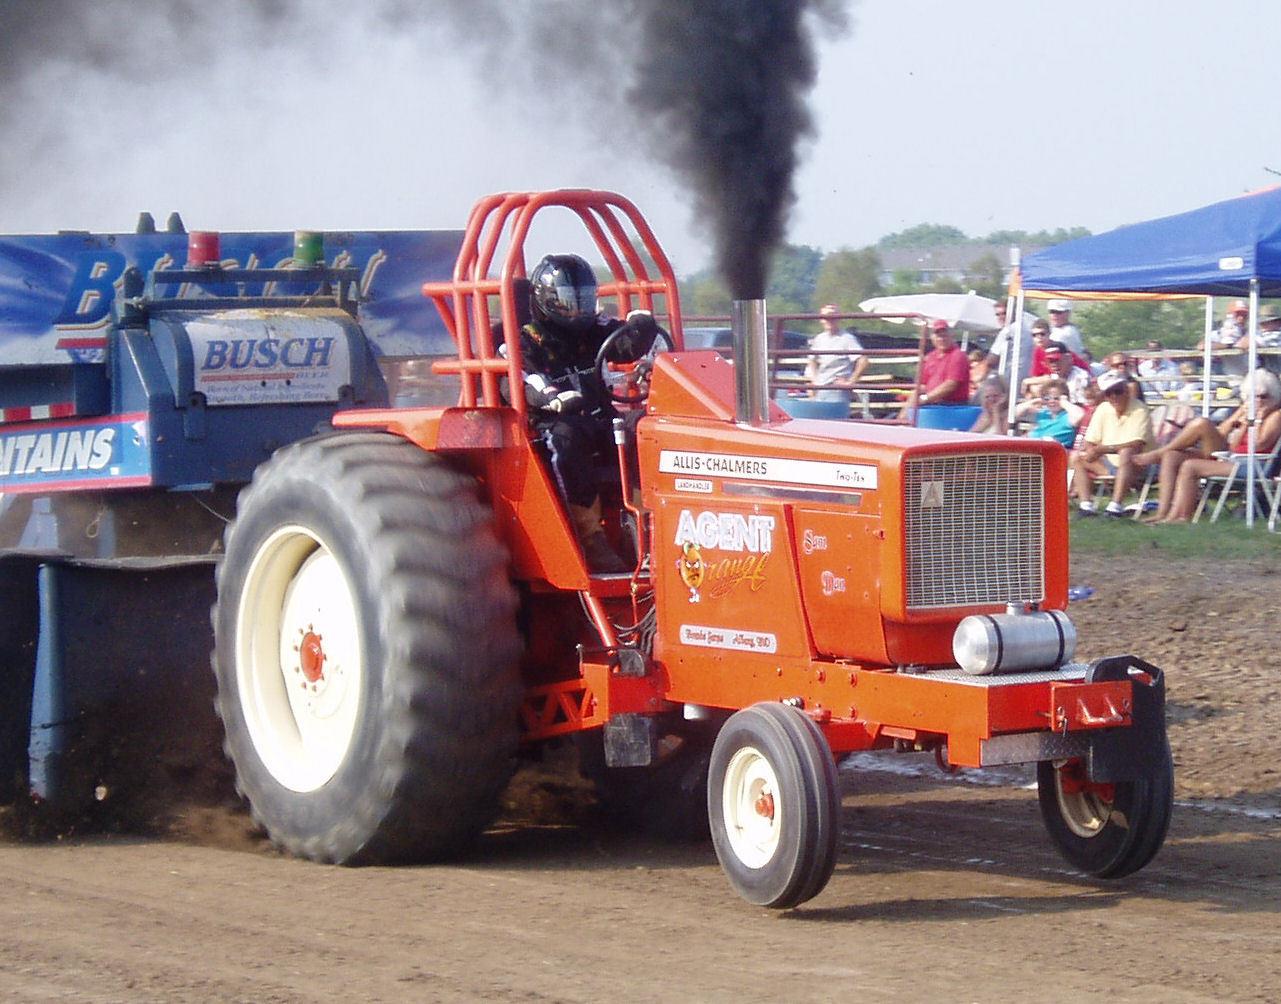 10x20 Center Fill Spun Aluminum Gas Tank - 6.75 Gallon Gallon Gallon - Tractor Pulling Set up b06845